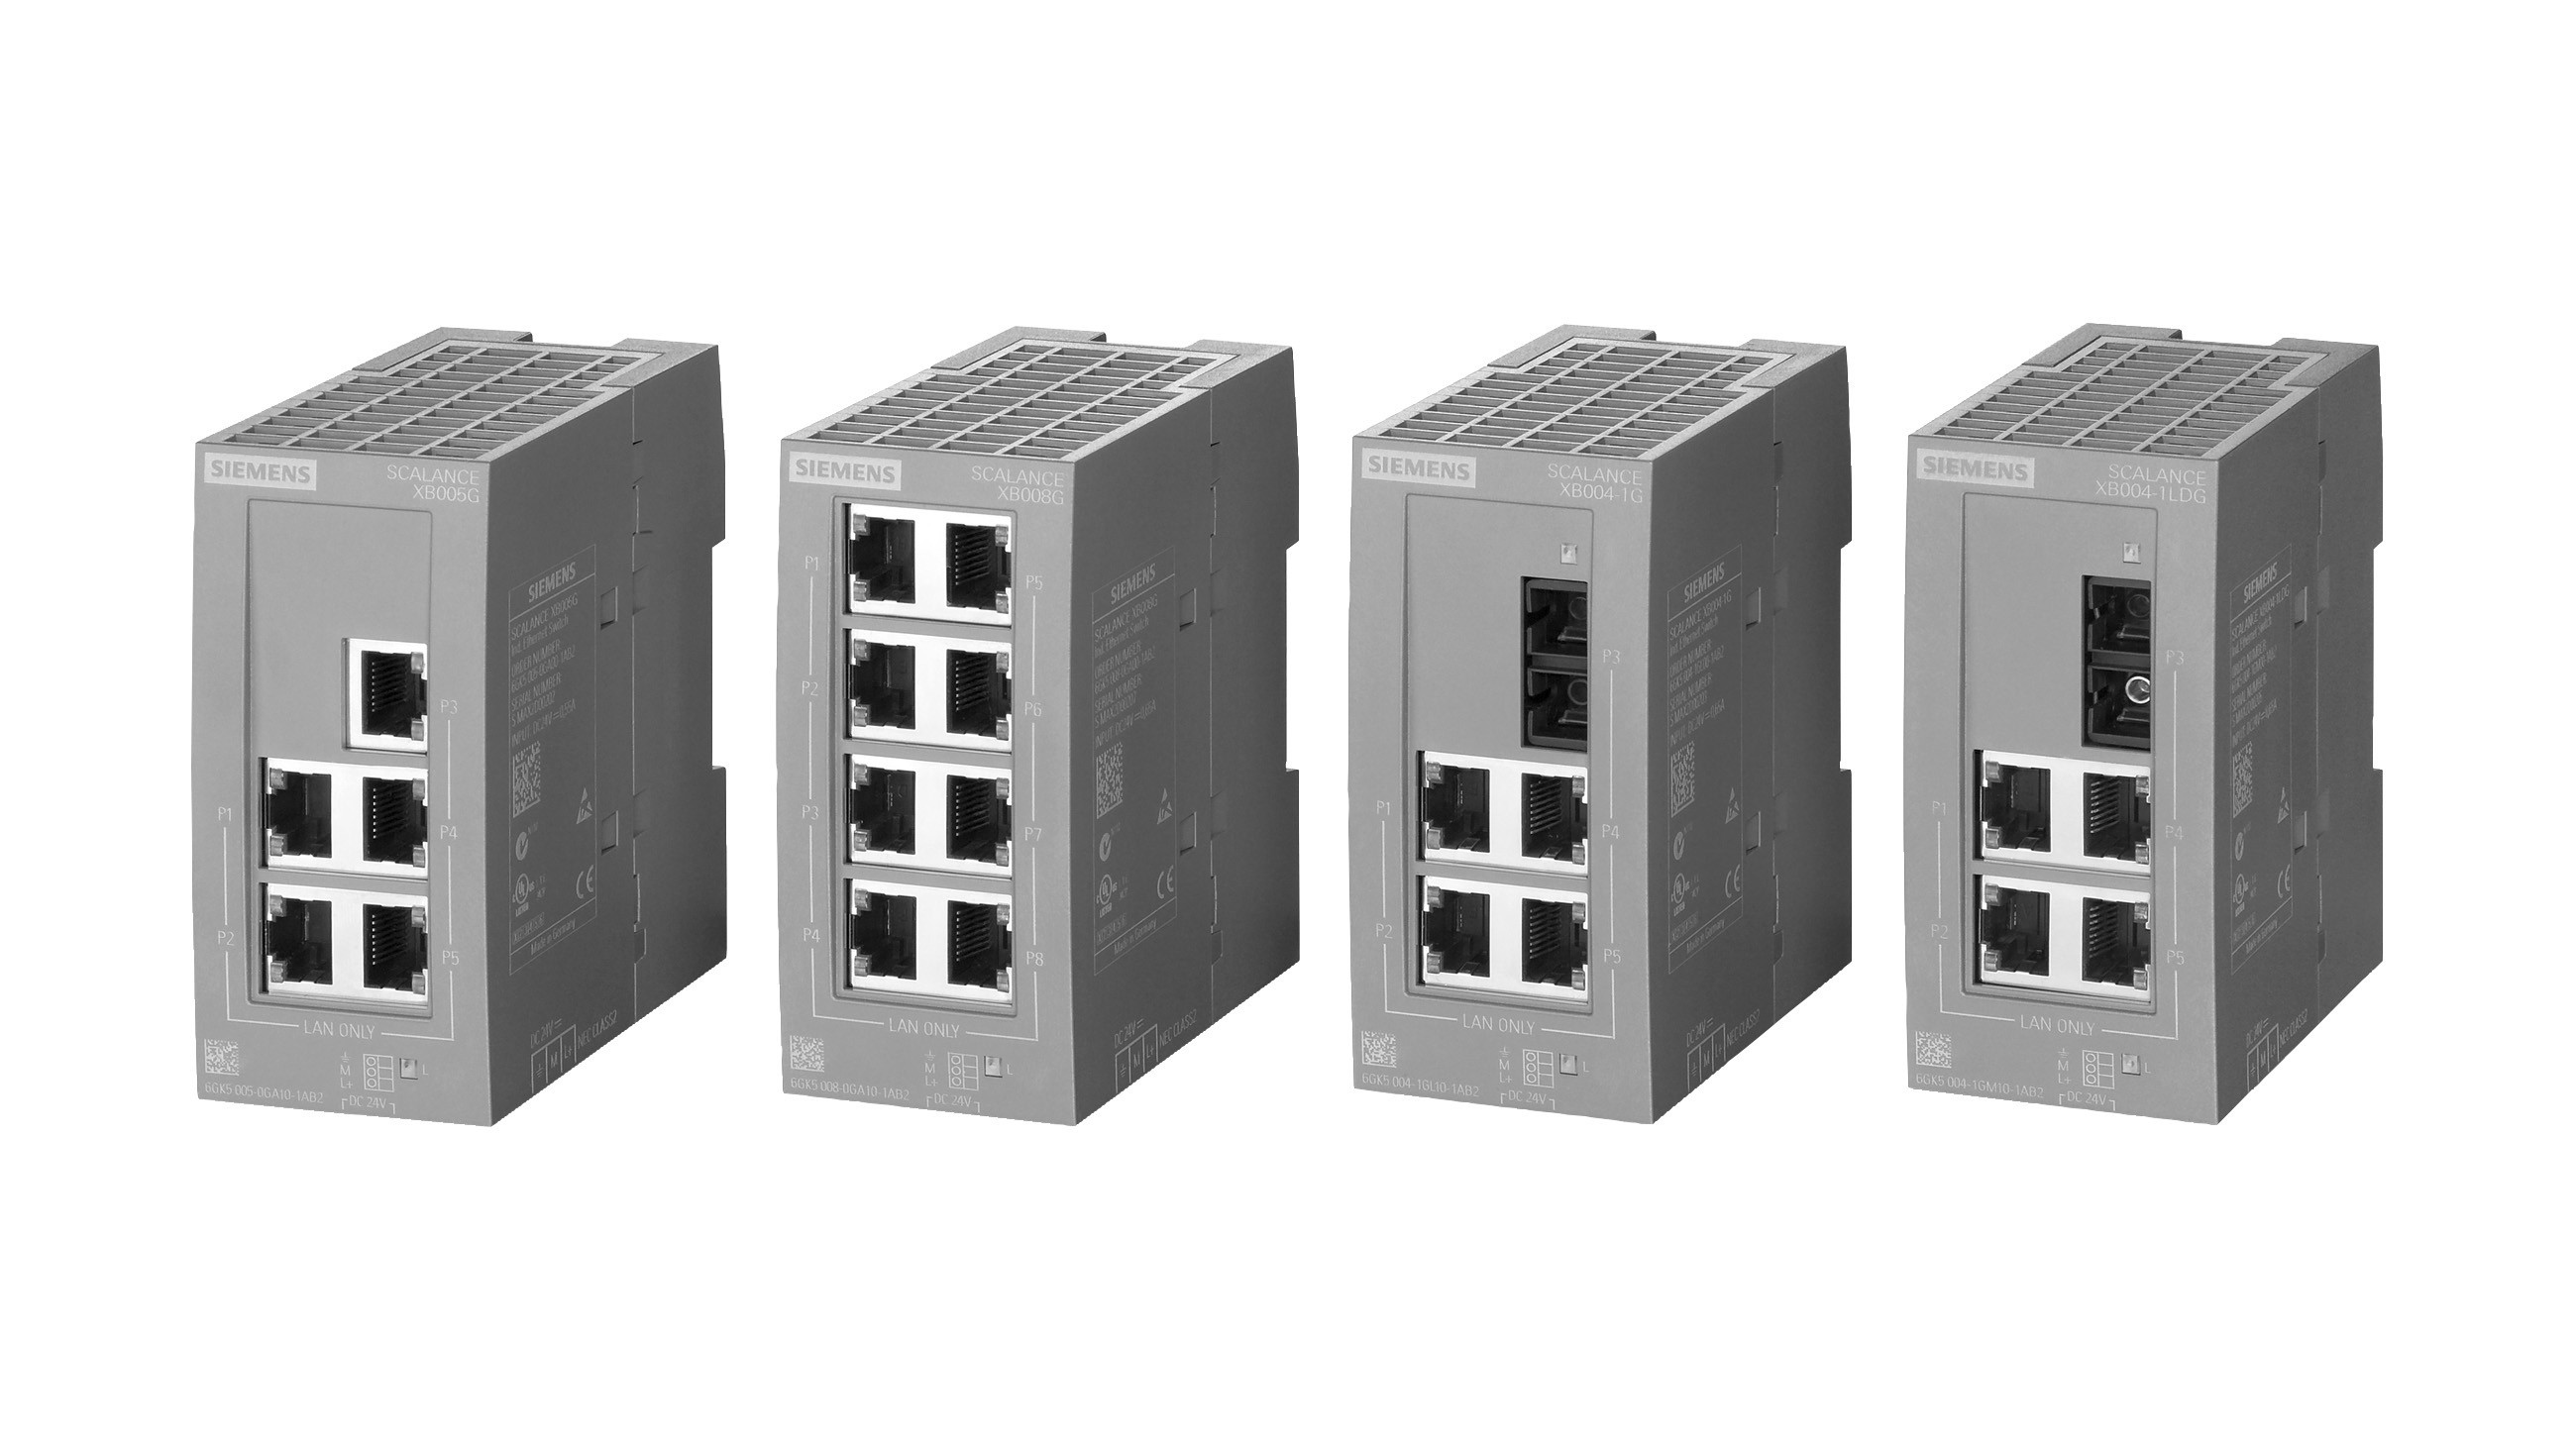 SIEMENS PLC S7 300